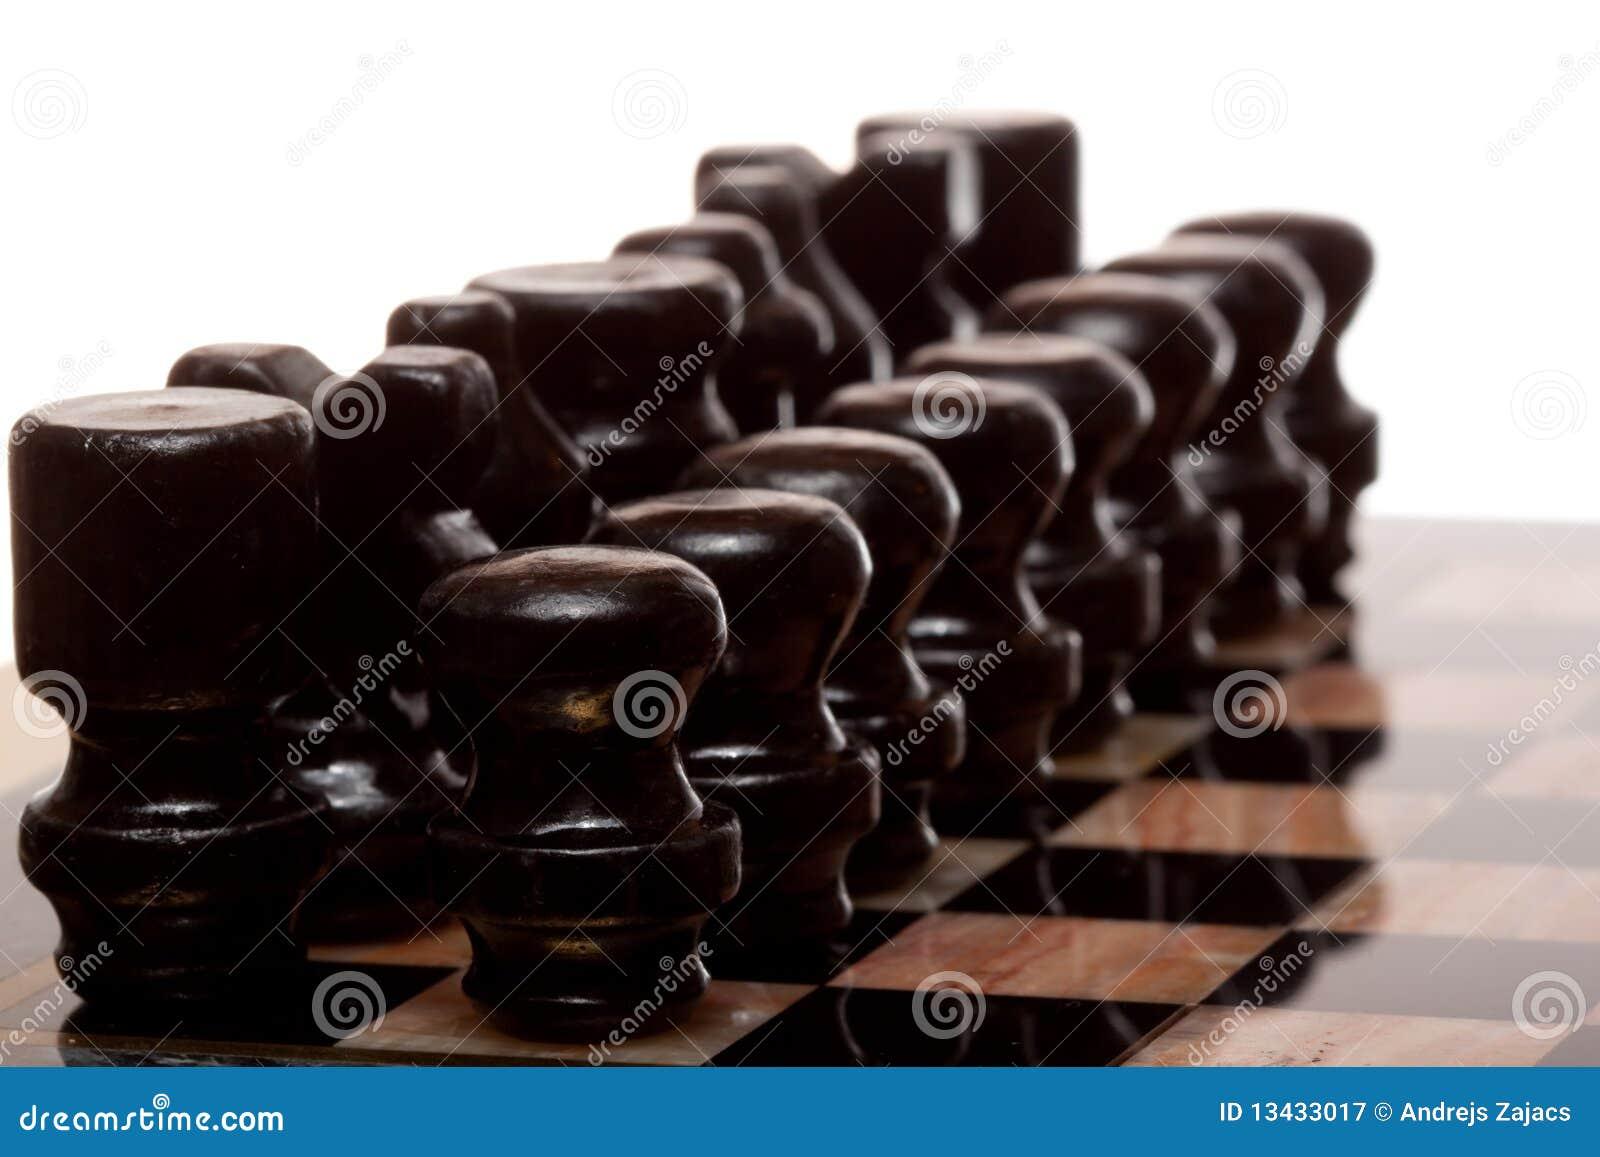 Black chessmans